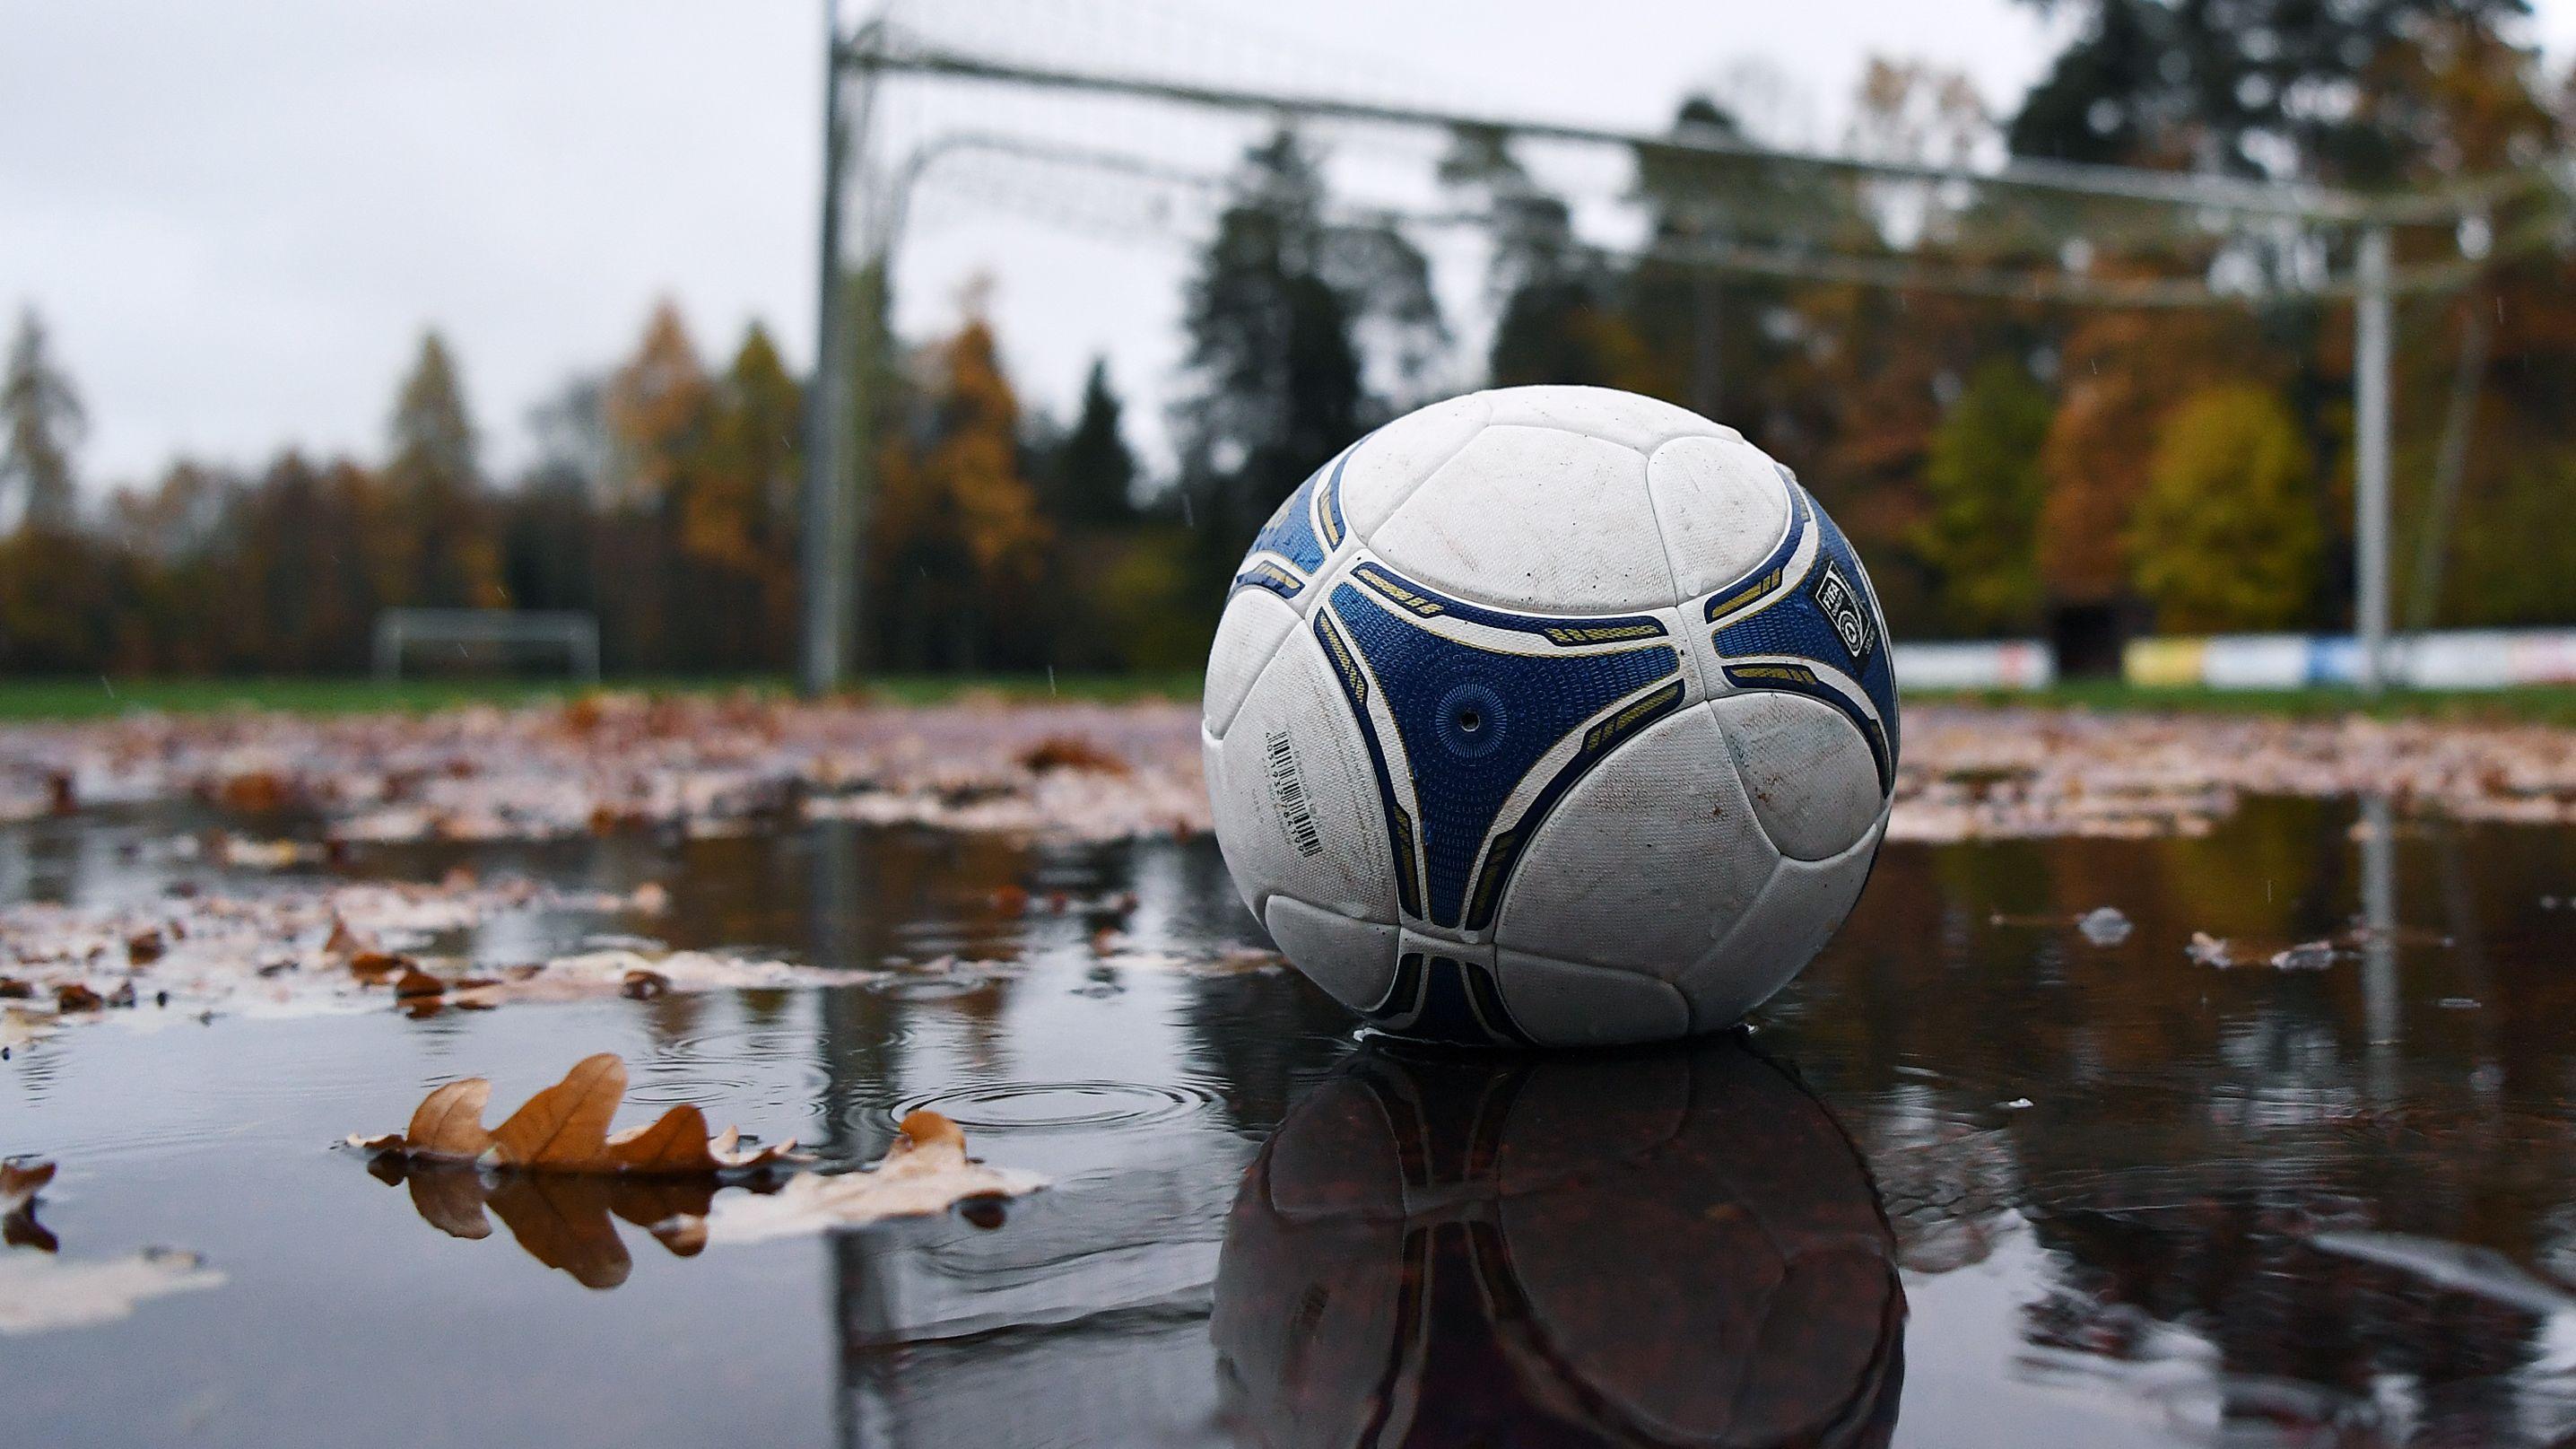 Symbolfoto Amateurfußball